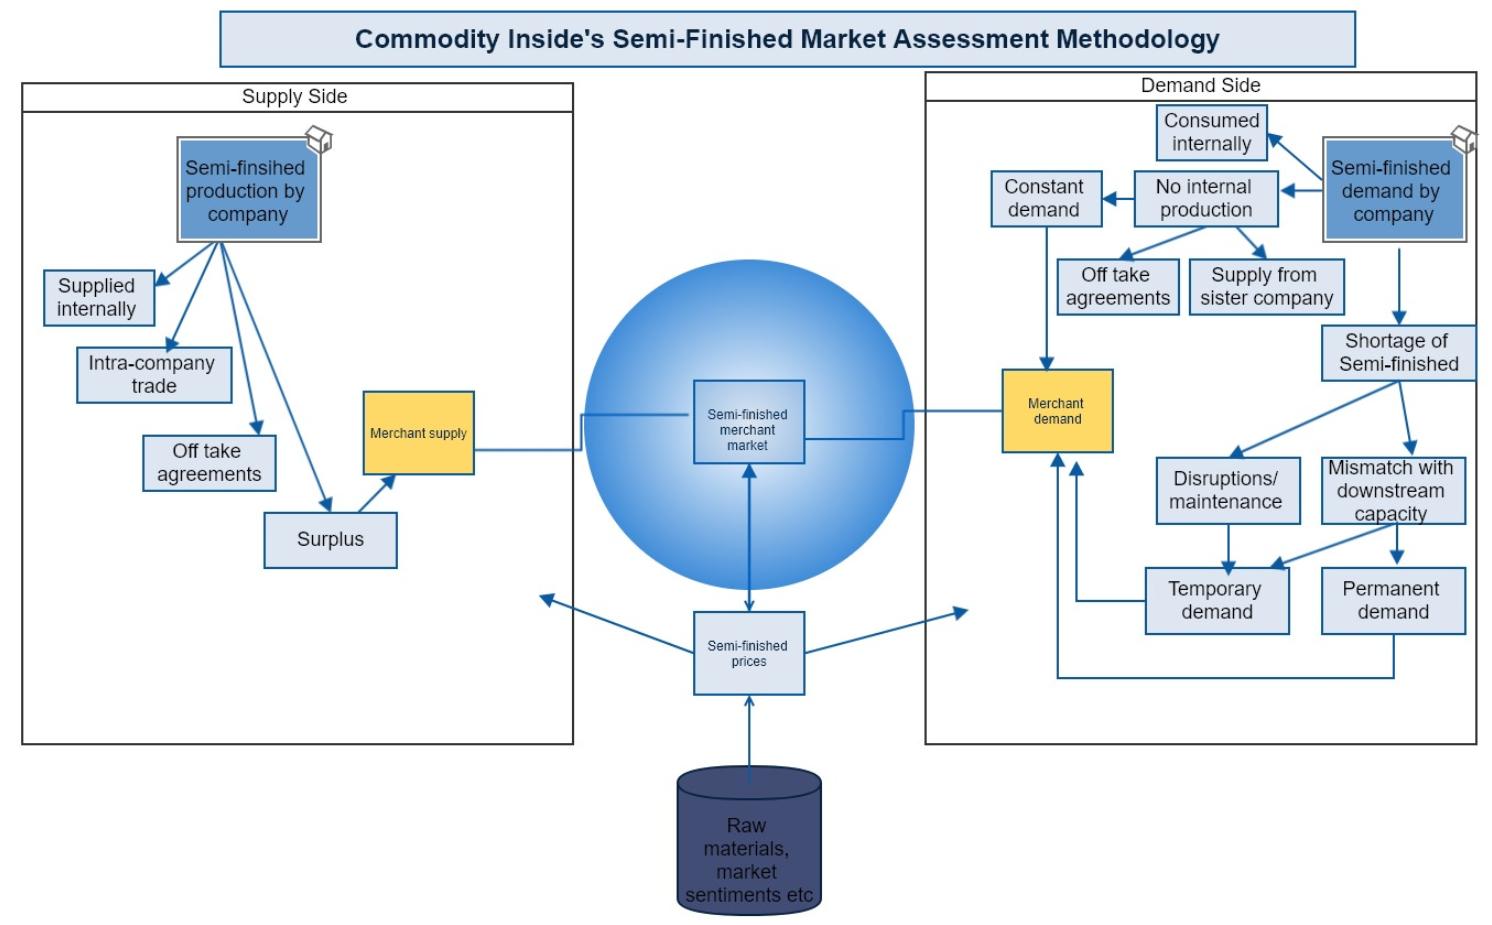 Global Merchant Steel slab market Methodology